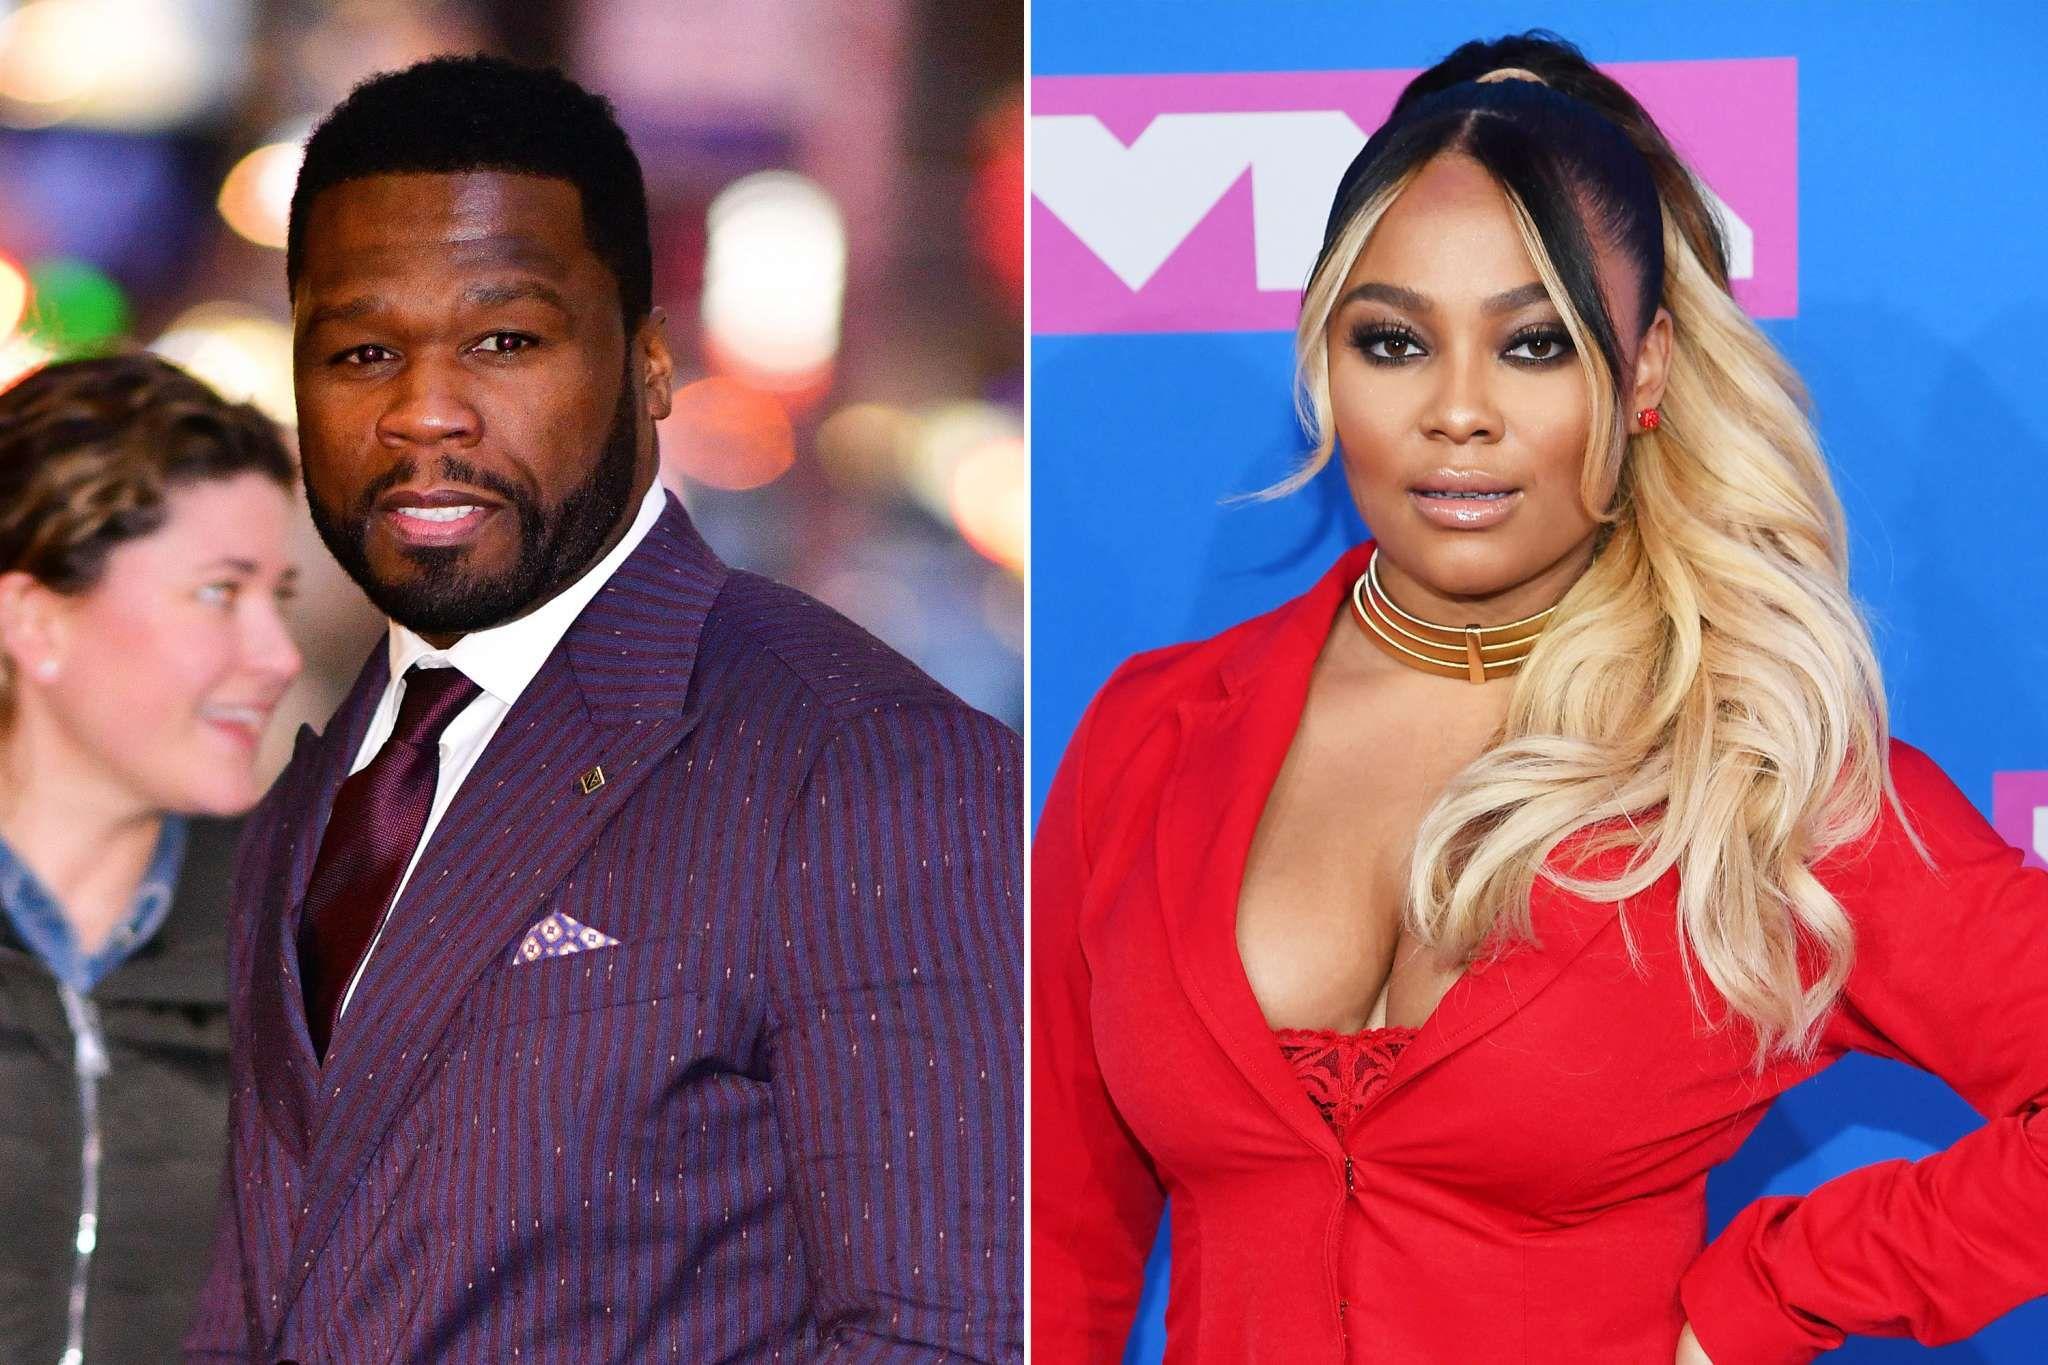 50 Cent Drags Teairra Mari After Report An Arrest Warrant Was